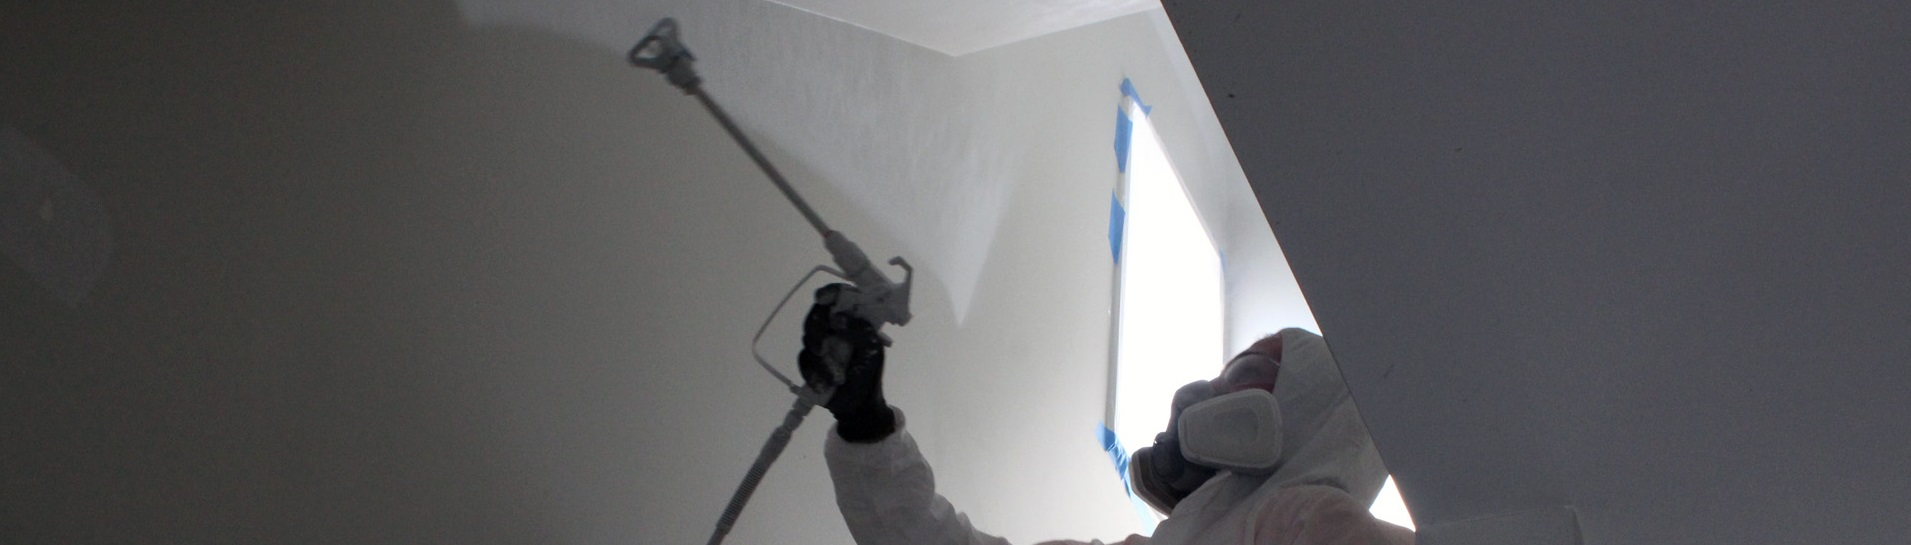 residential-spray-painting.jpg